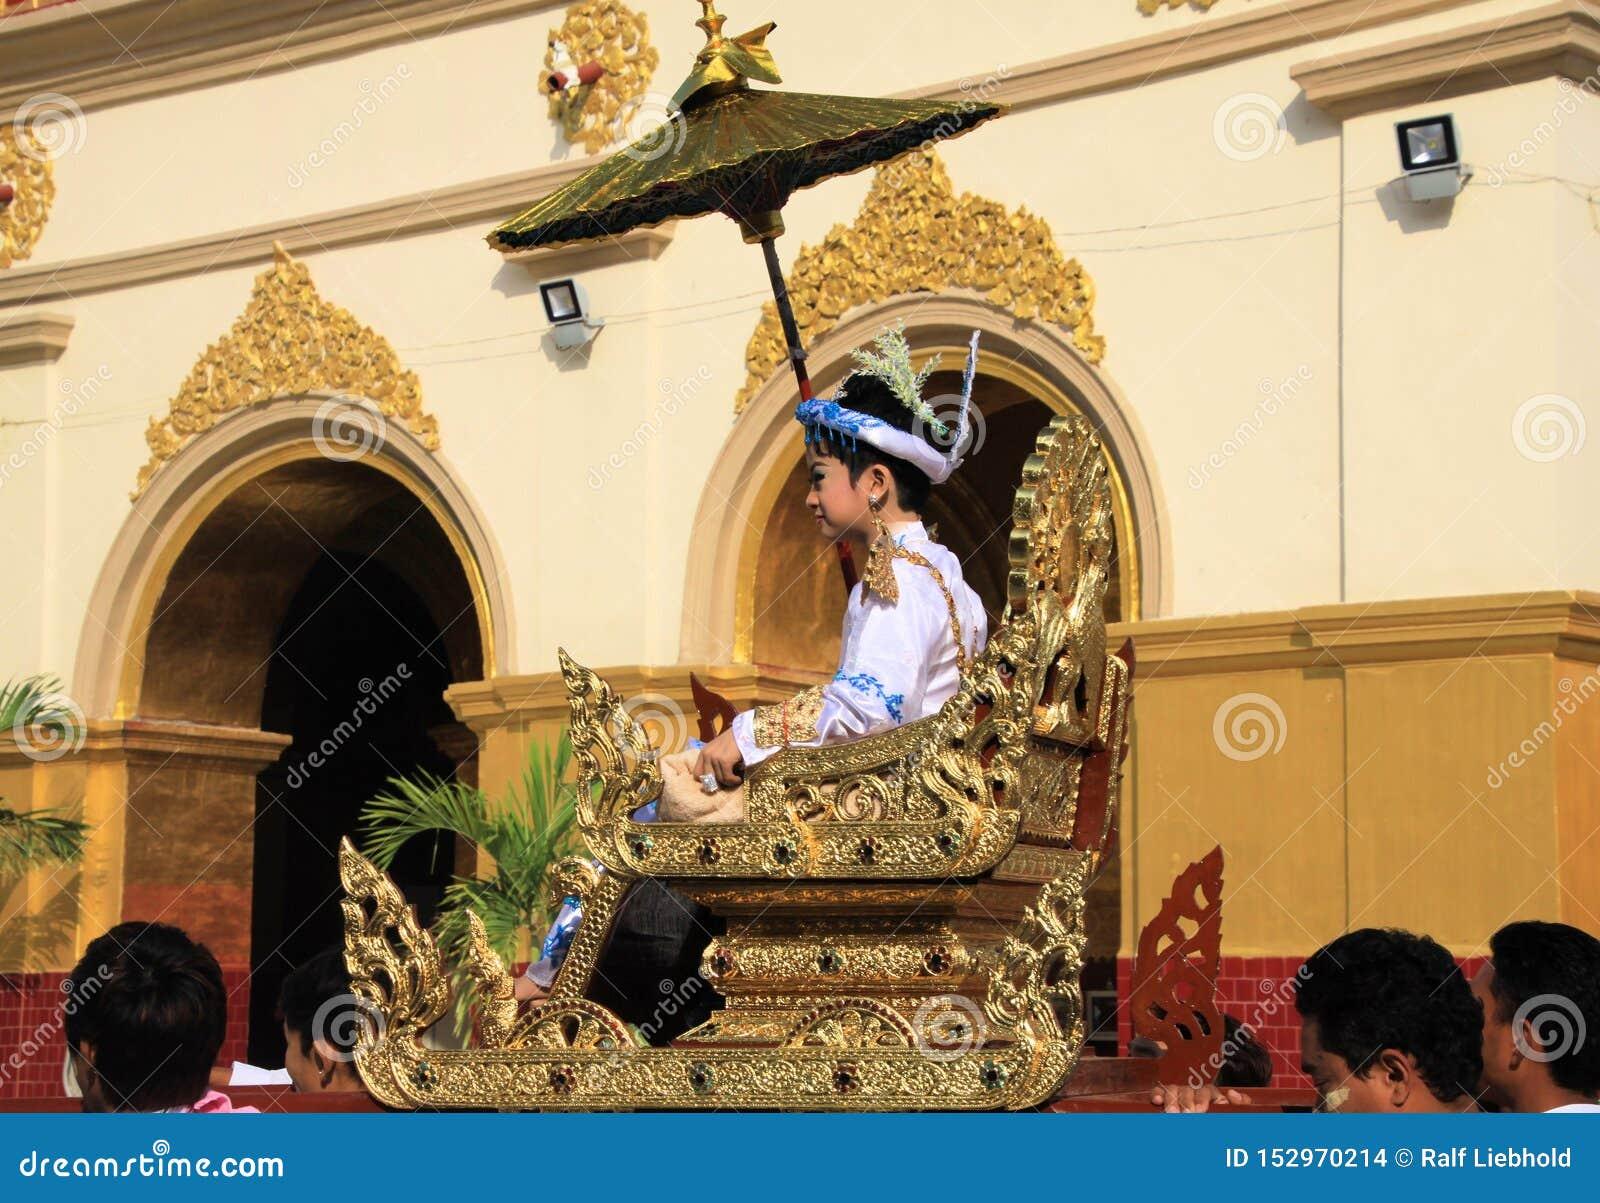 MANDALAY, MYANMAR - DECEMBER 18. 2015: Novitiation novitiate ceremony Shinbyu for young Buddhist boy on sedan chair at Maha